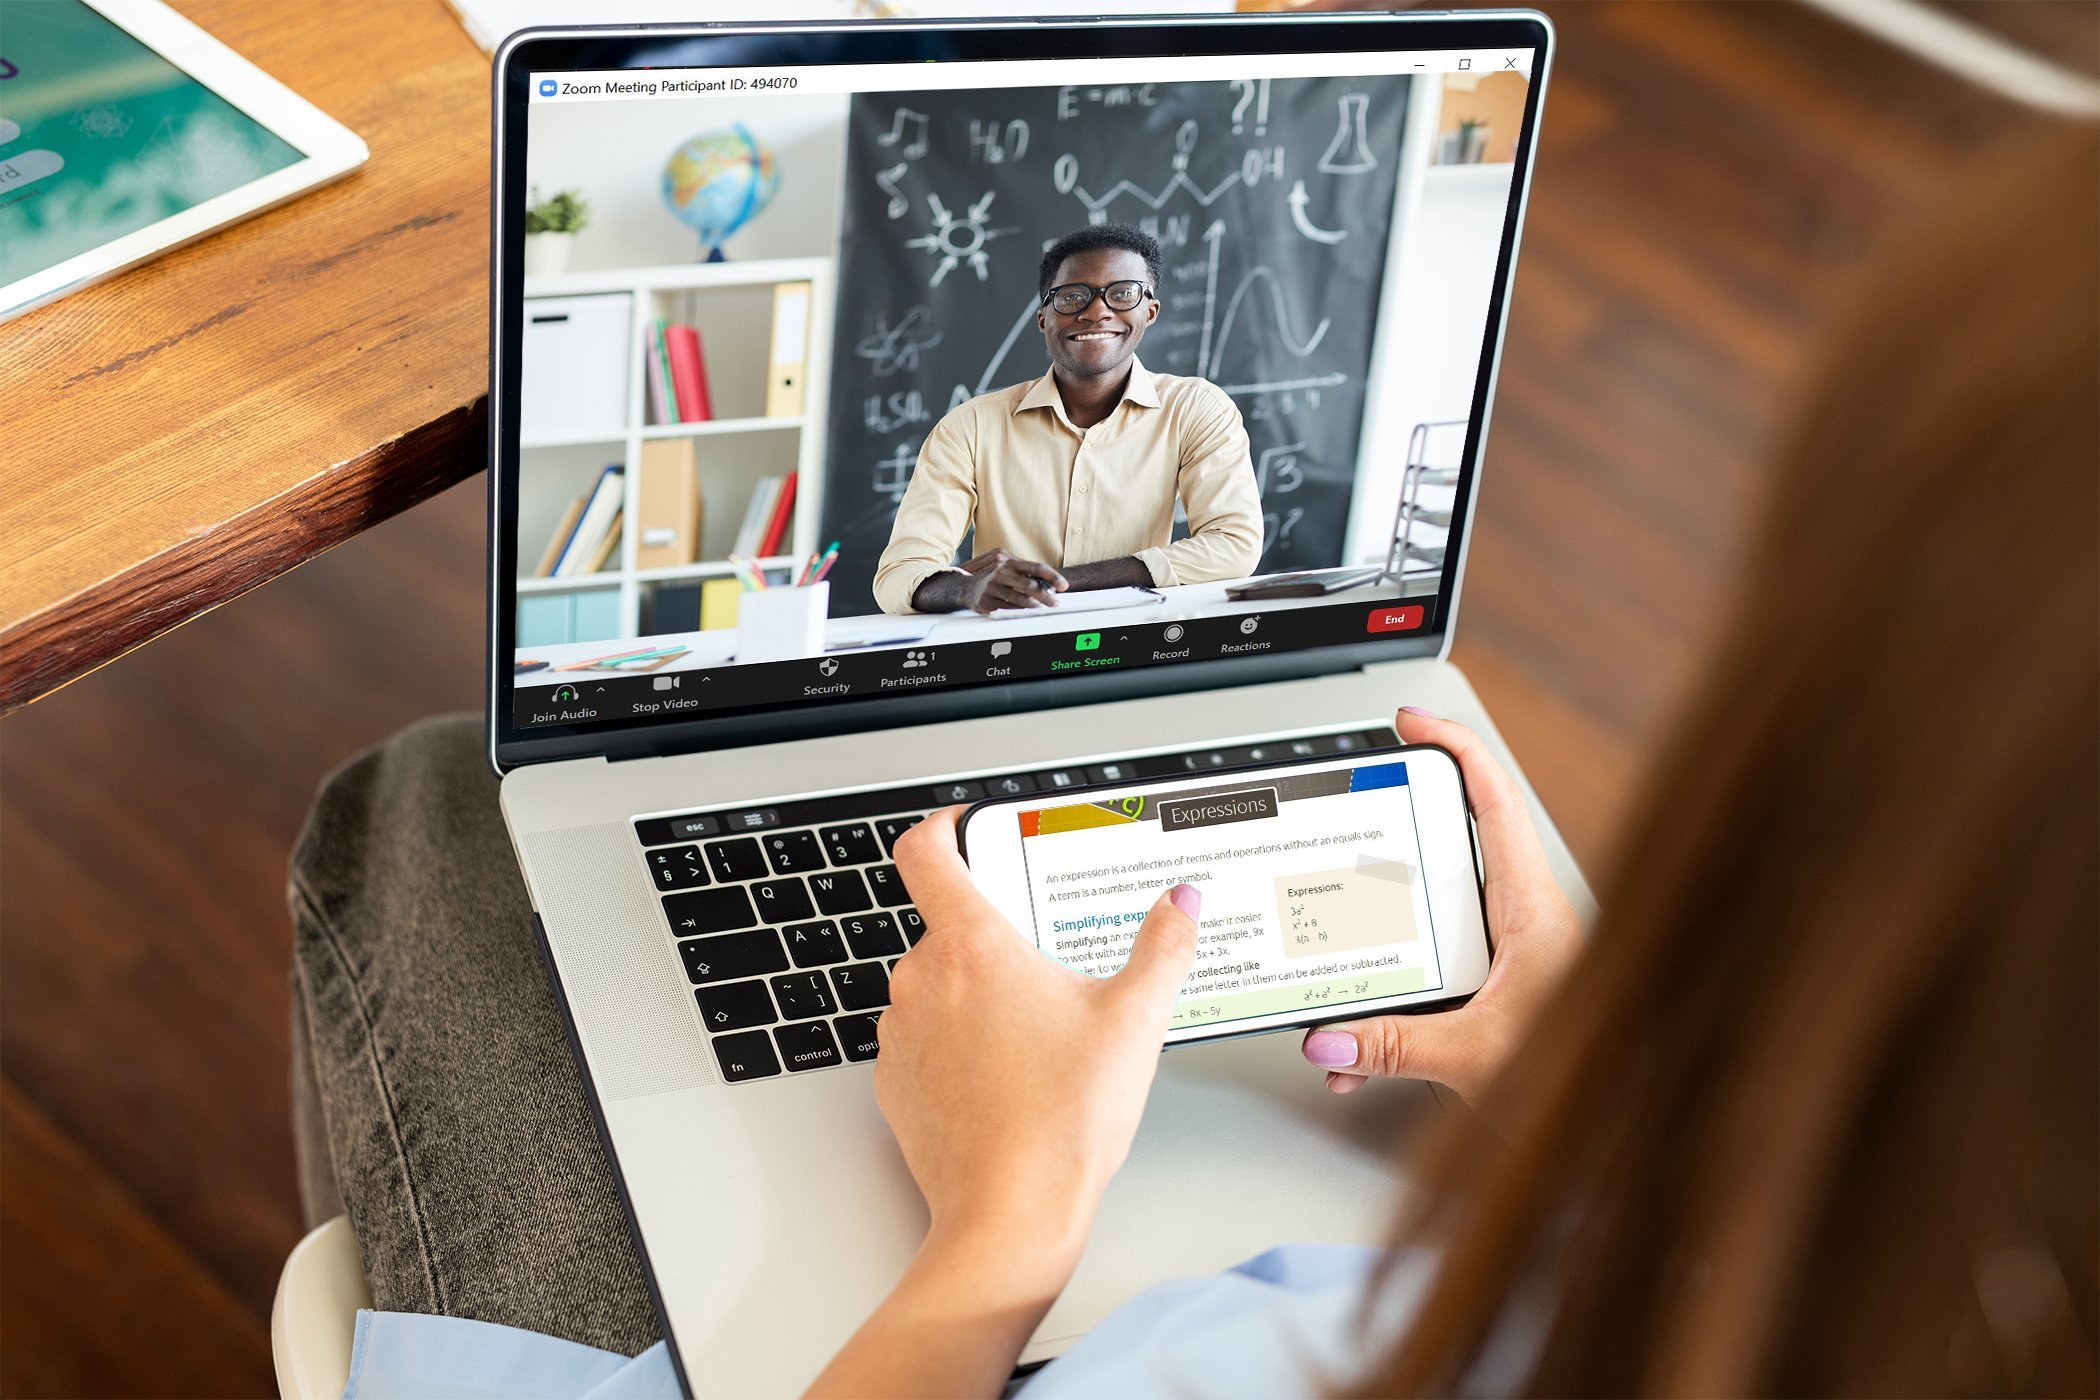 https://careernet.com/wp-content/uploads/2020/09/7x4-Educators-pic.jpg